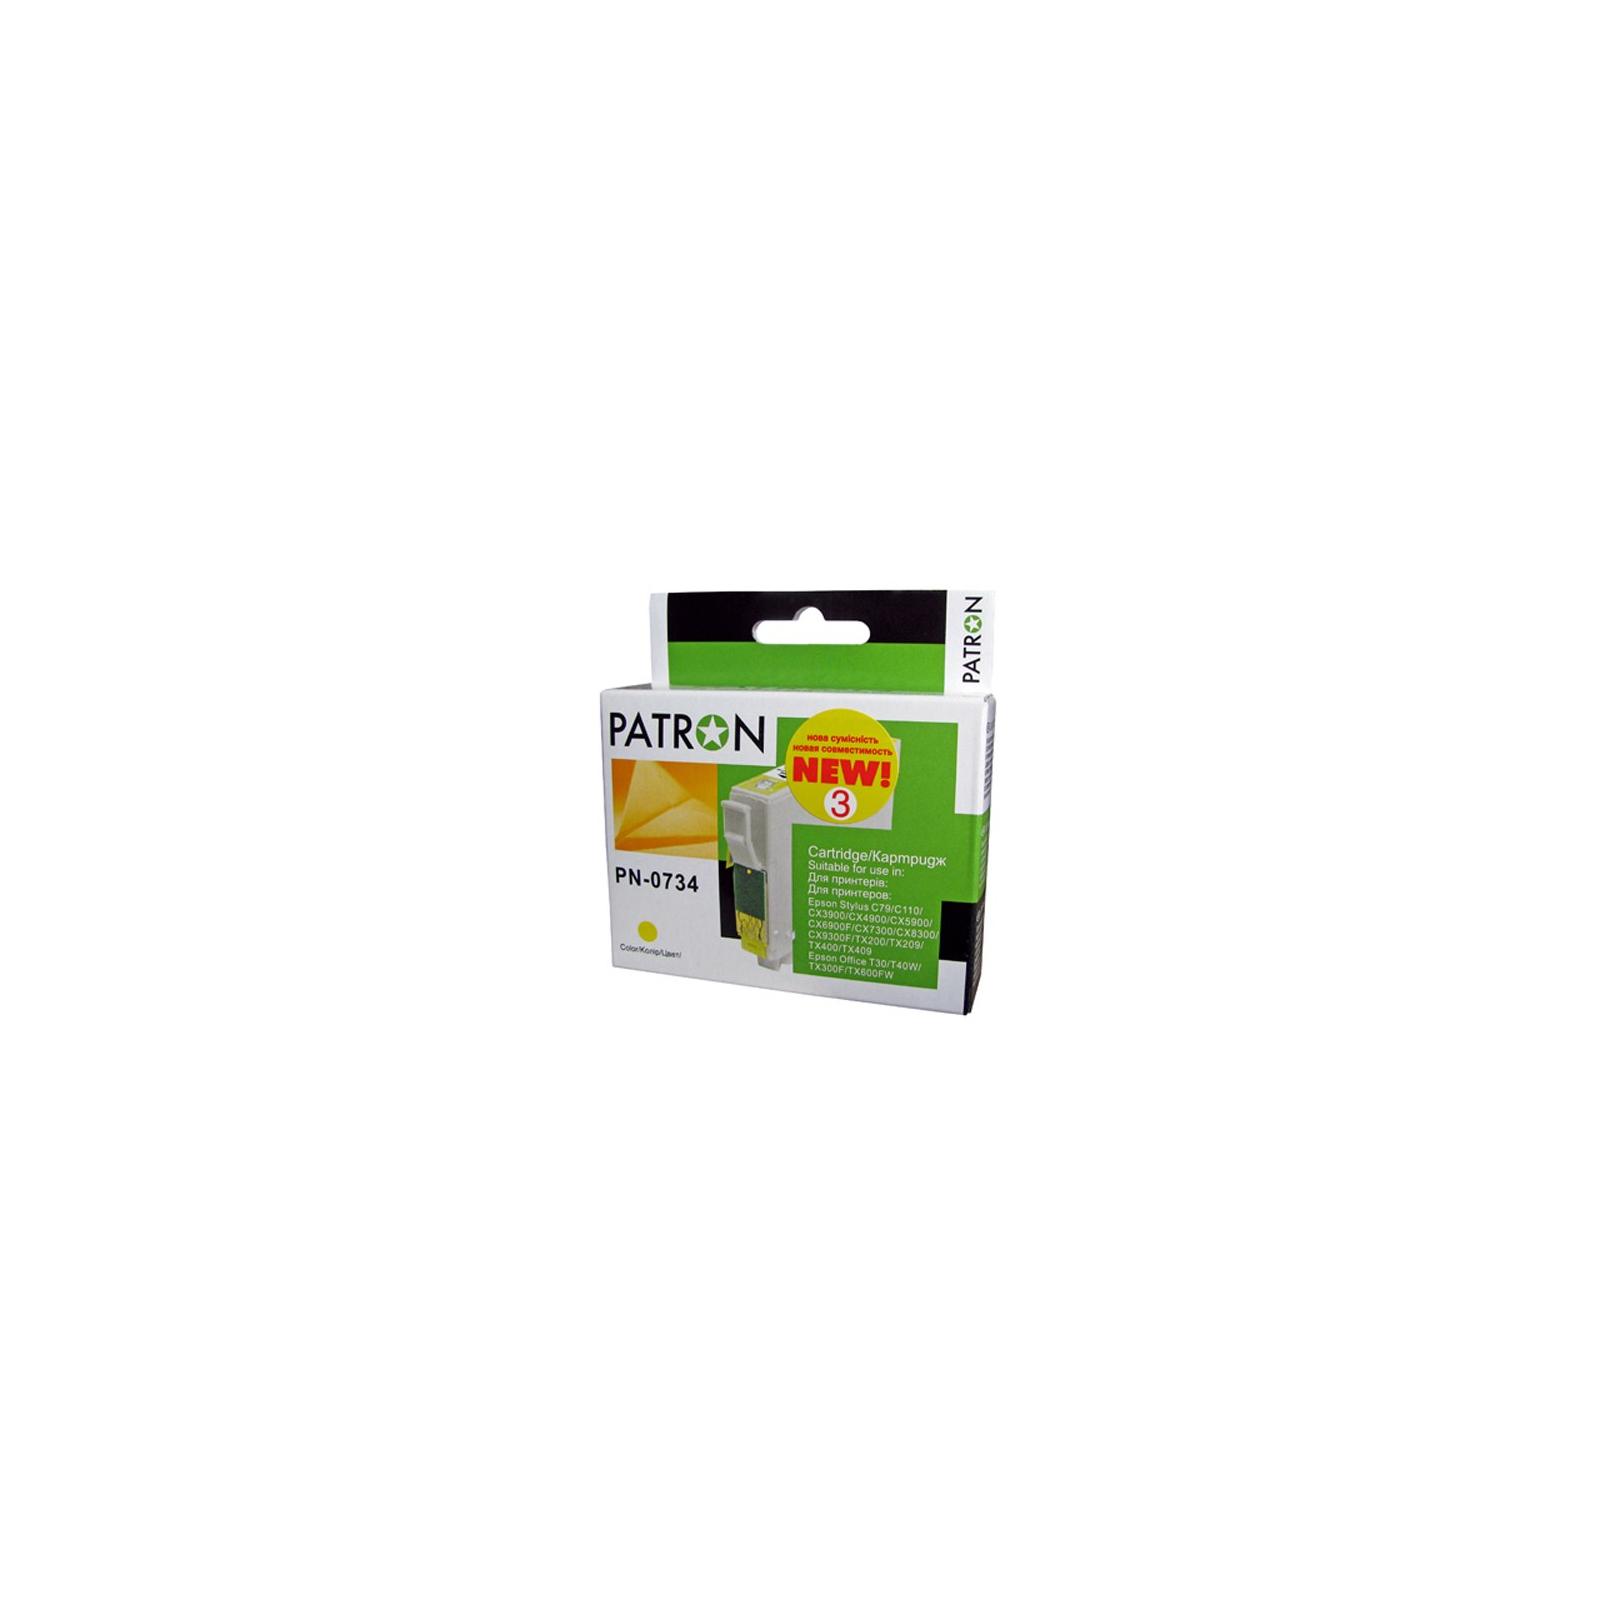 Картридж PATRON для EPSON C79/C110/TX200 yellow (CI-EPS-T07344-Y3-PN) изображение 2